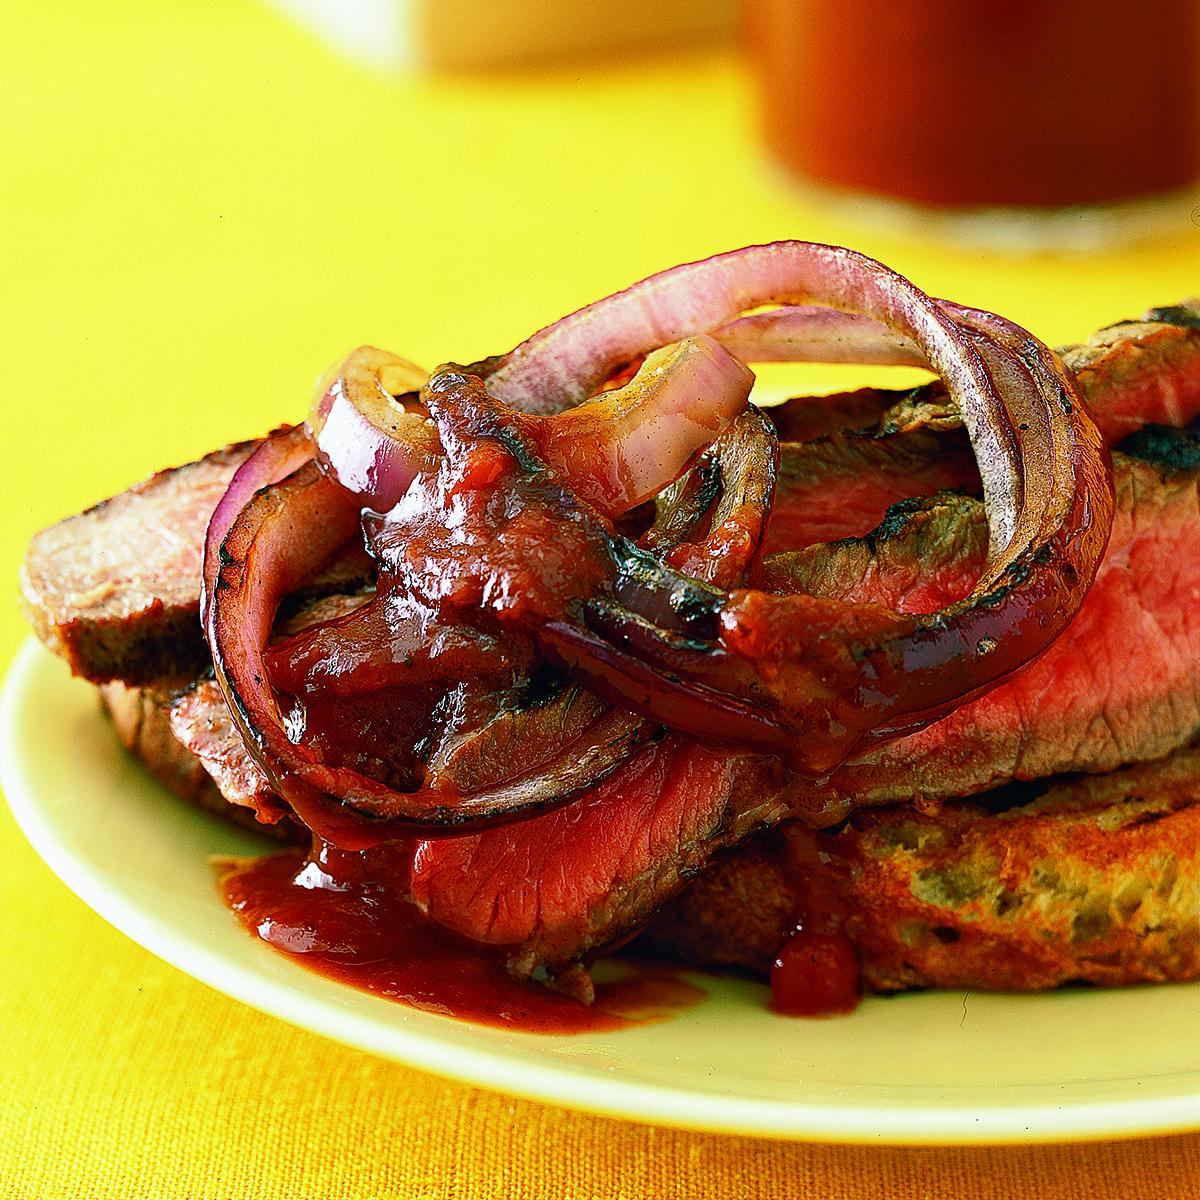 Grilled Rib-Eye Steaks with Cola Steak Sauce